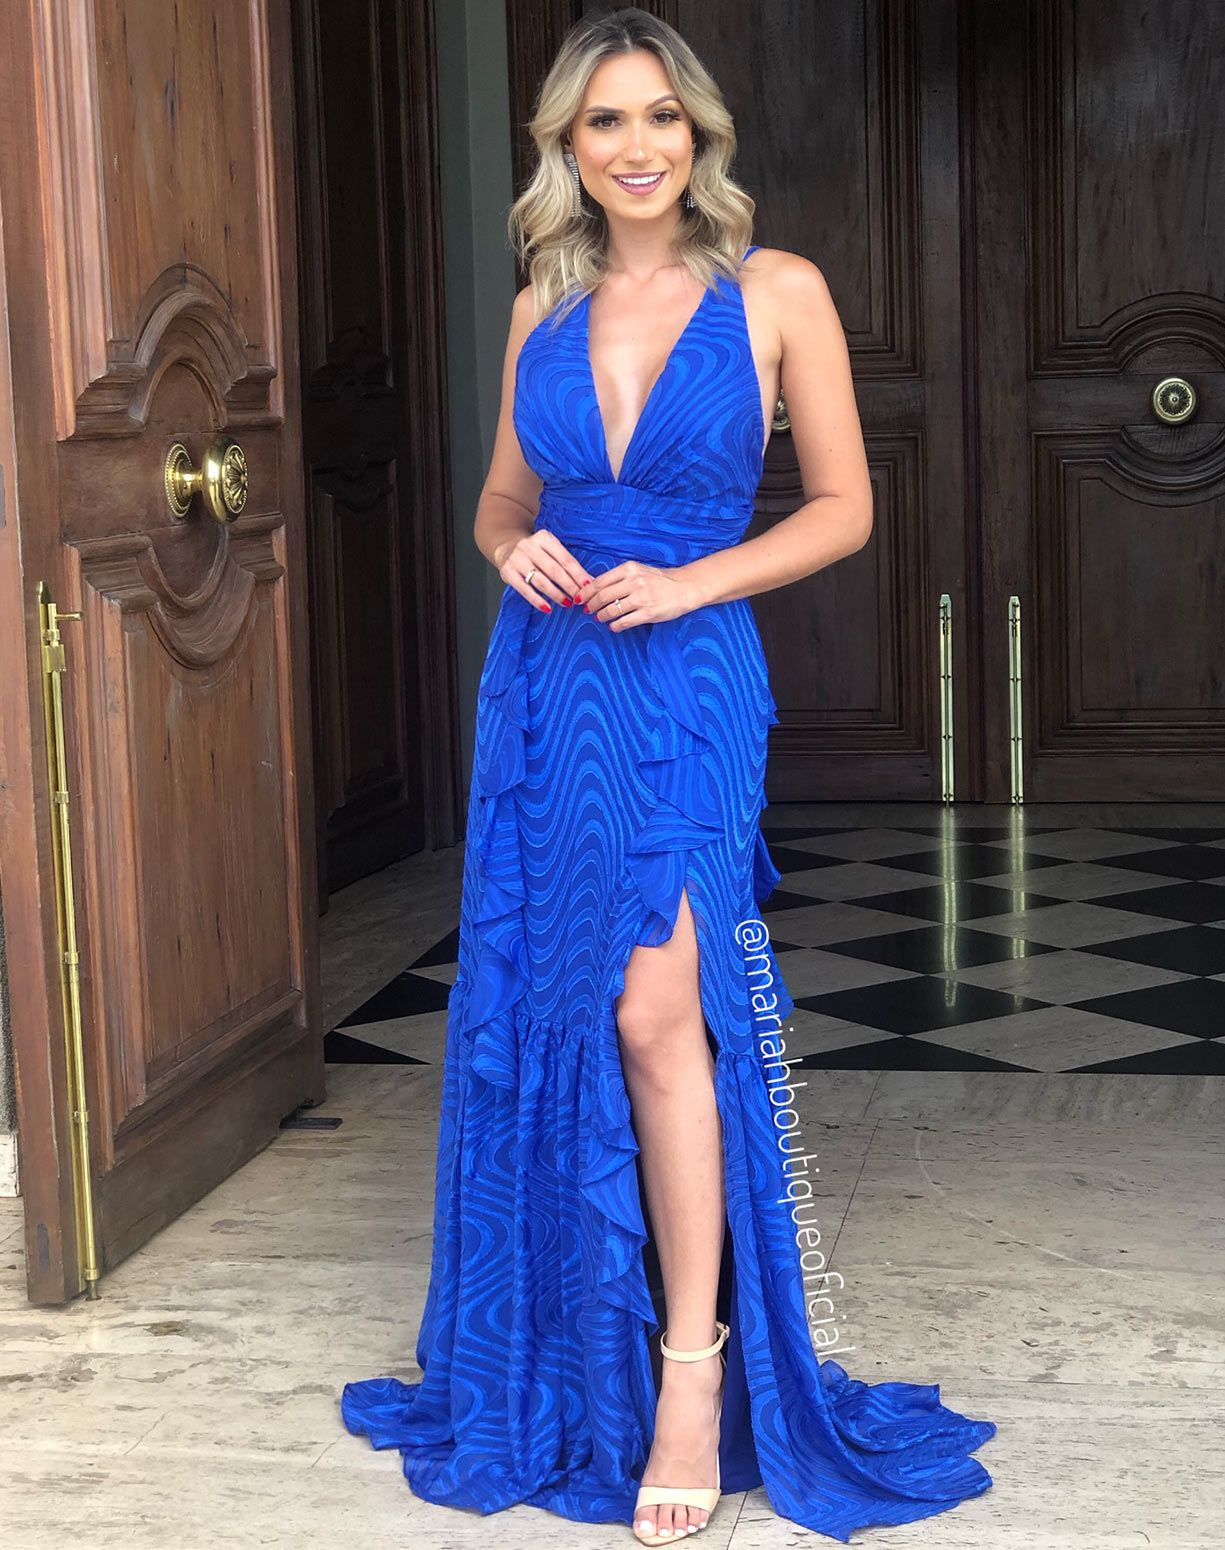 Vestido Azul Royal Texturizado Com Babados